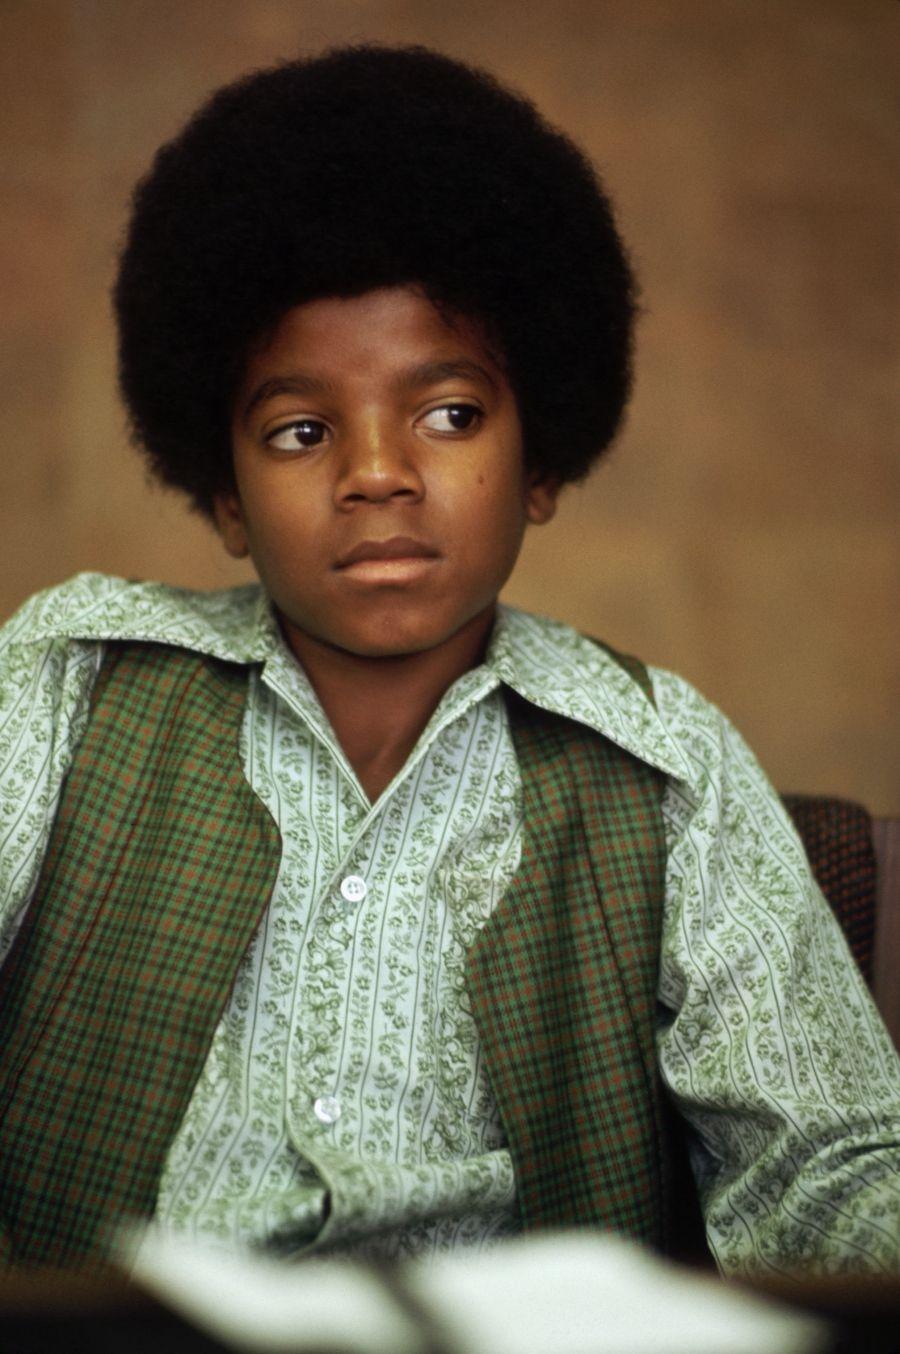 Lil' Michael